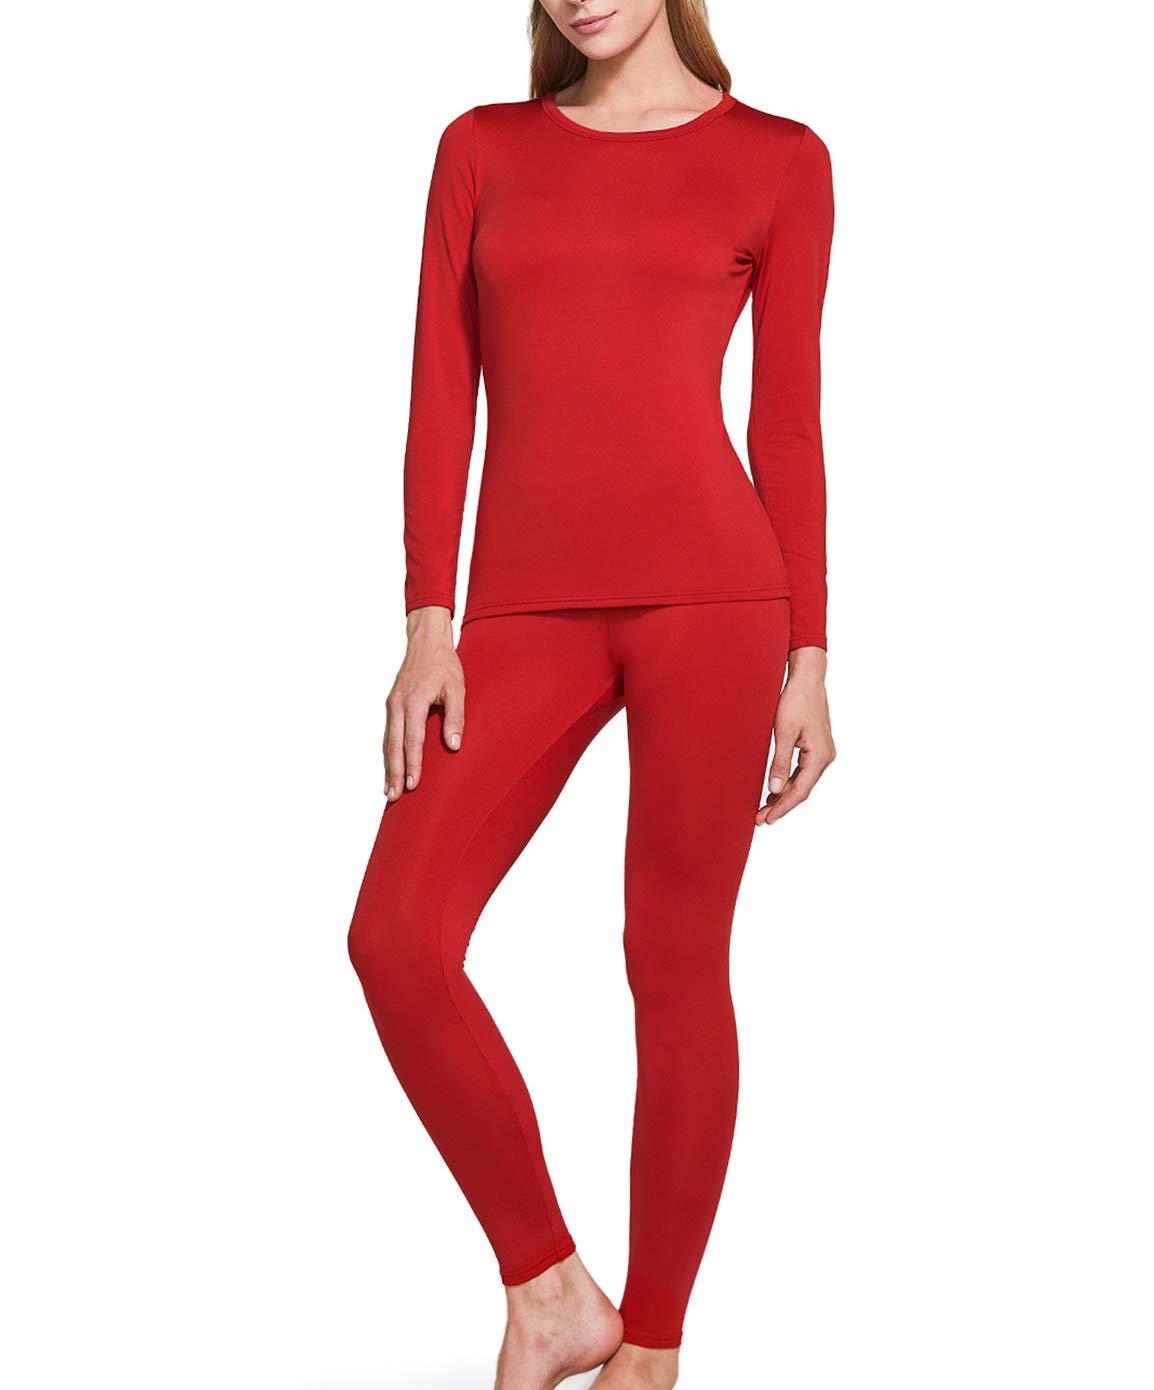 TSLA Blank Women's Top & Bottom Set w Microfiber, Thermal Set(whs200) - Red, Large by TSLA